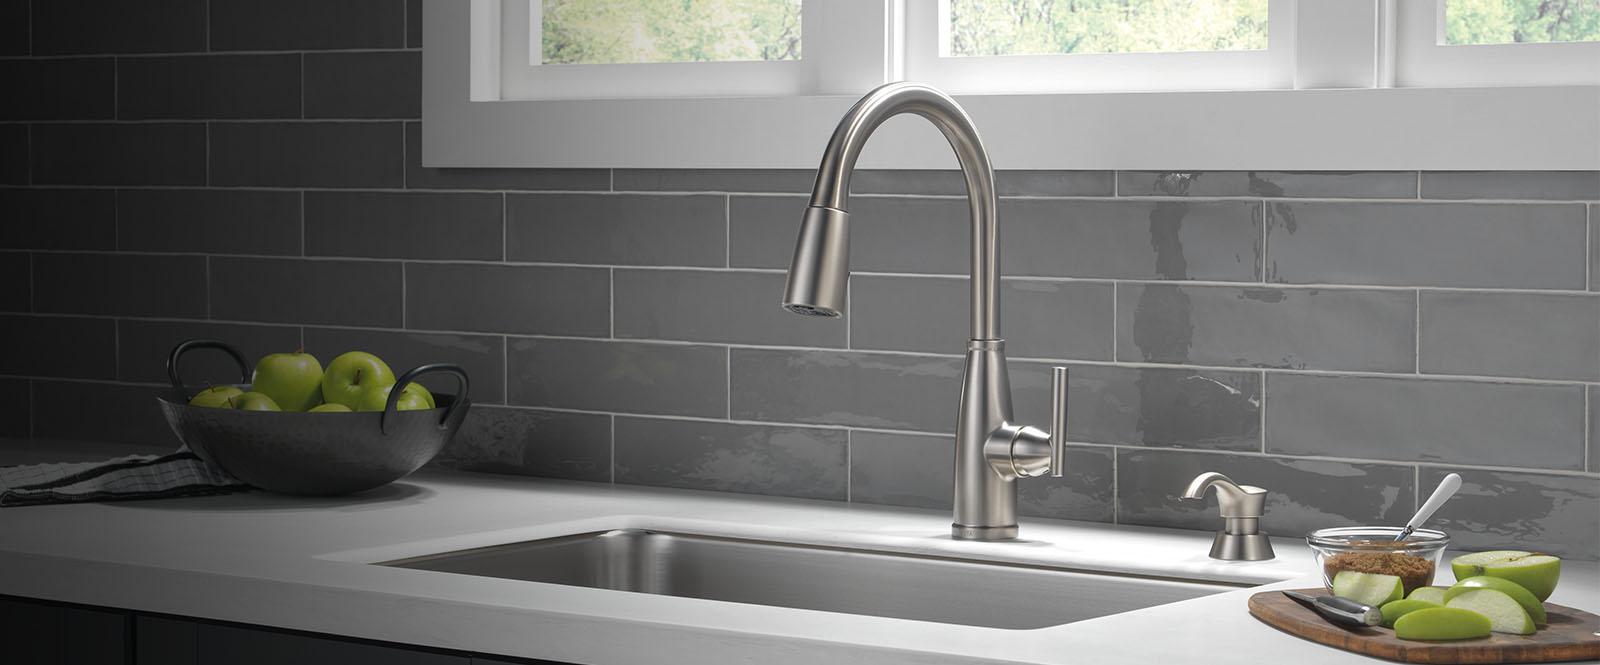 varos kitchen collection delta faucet